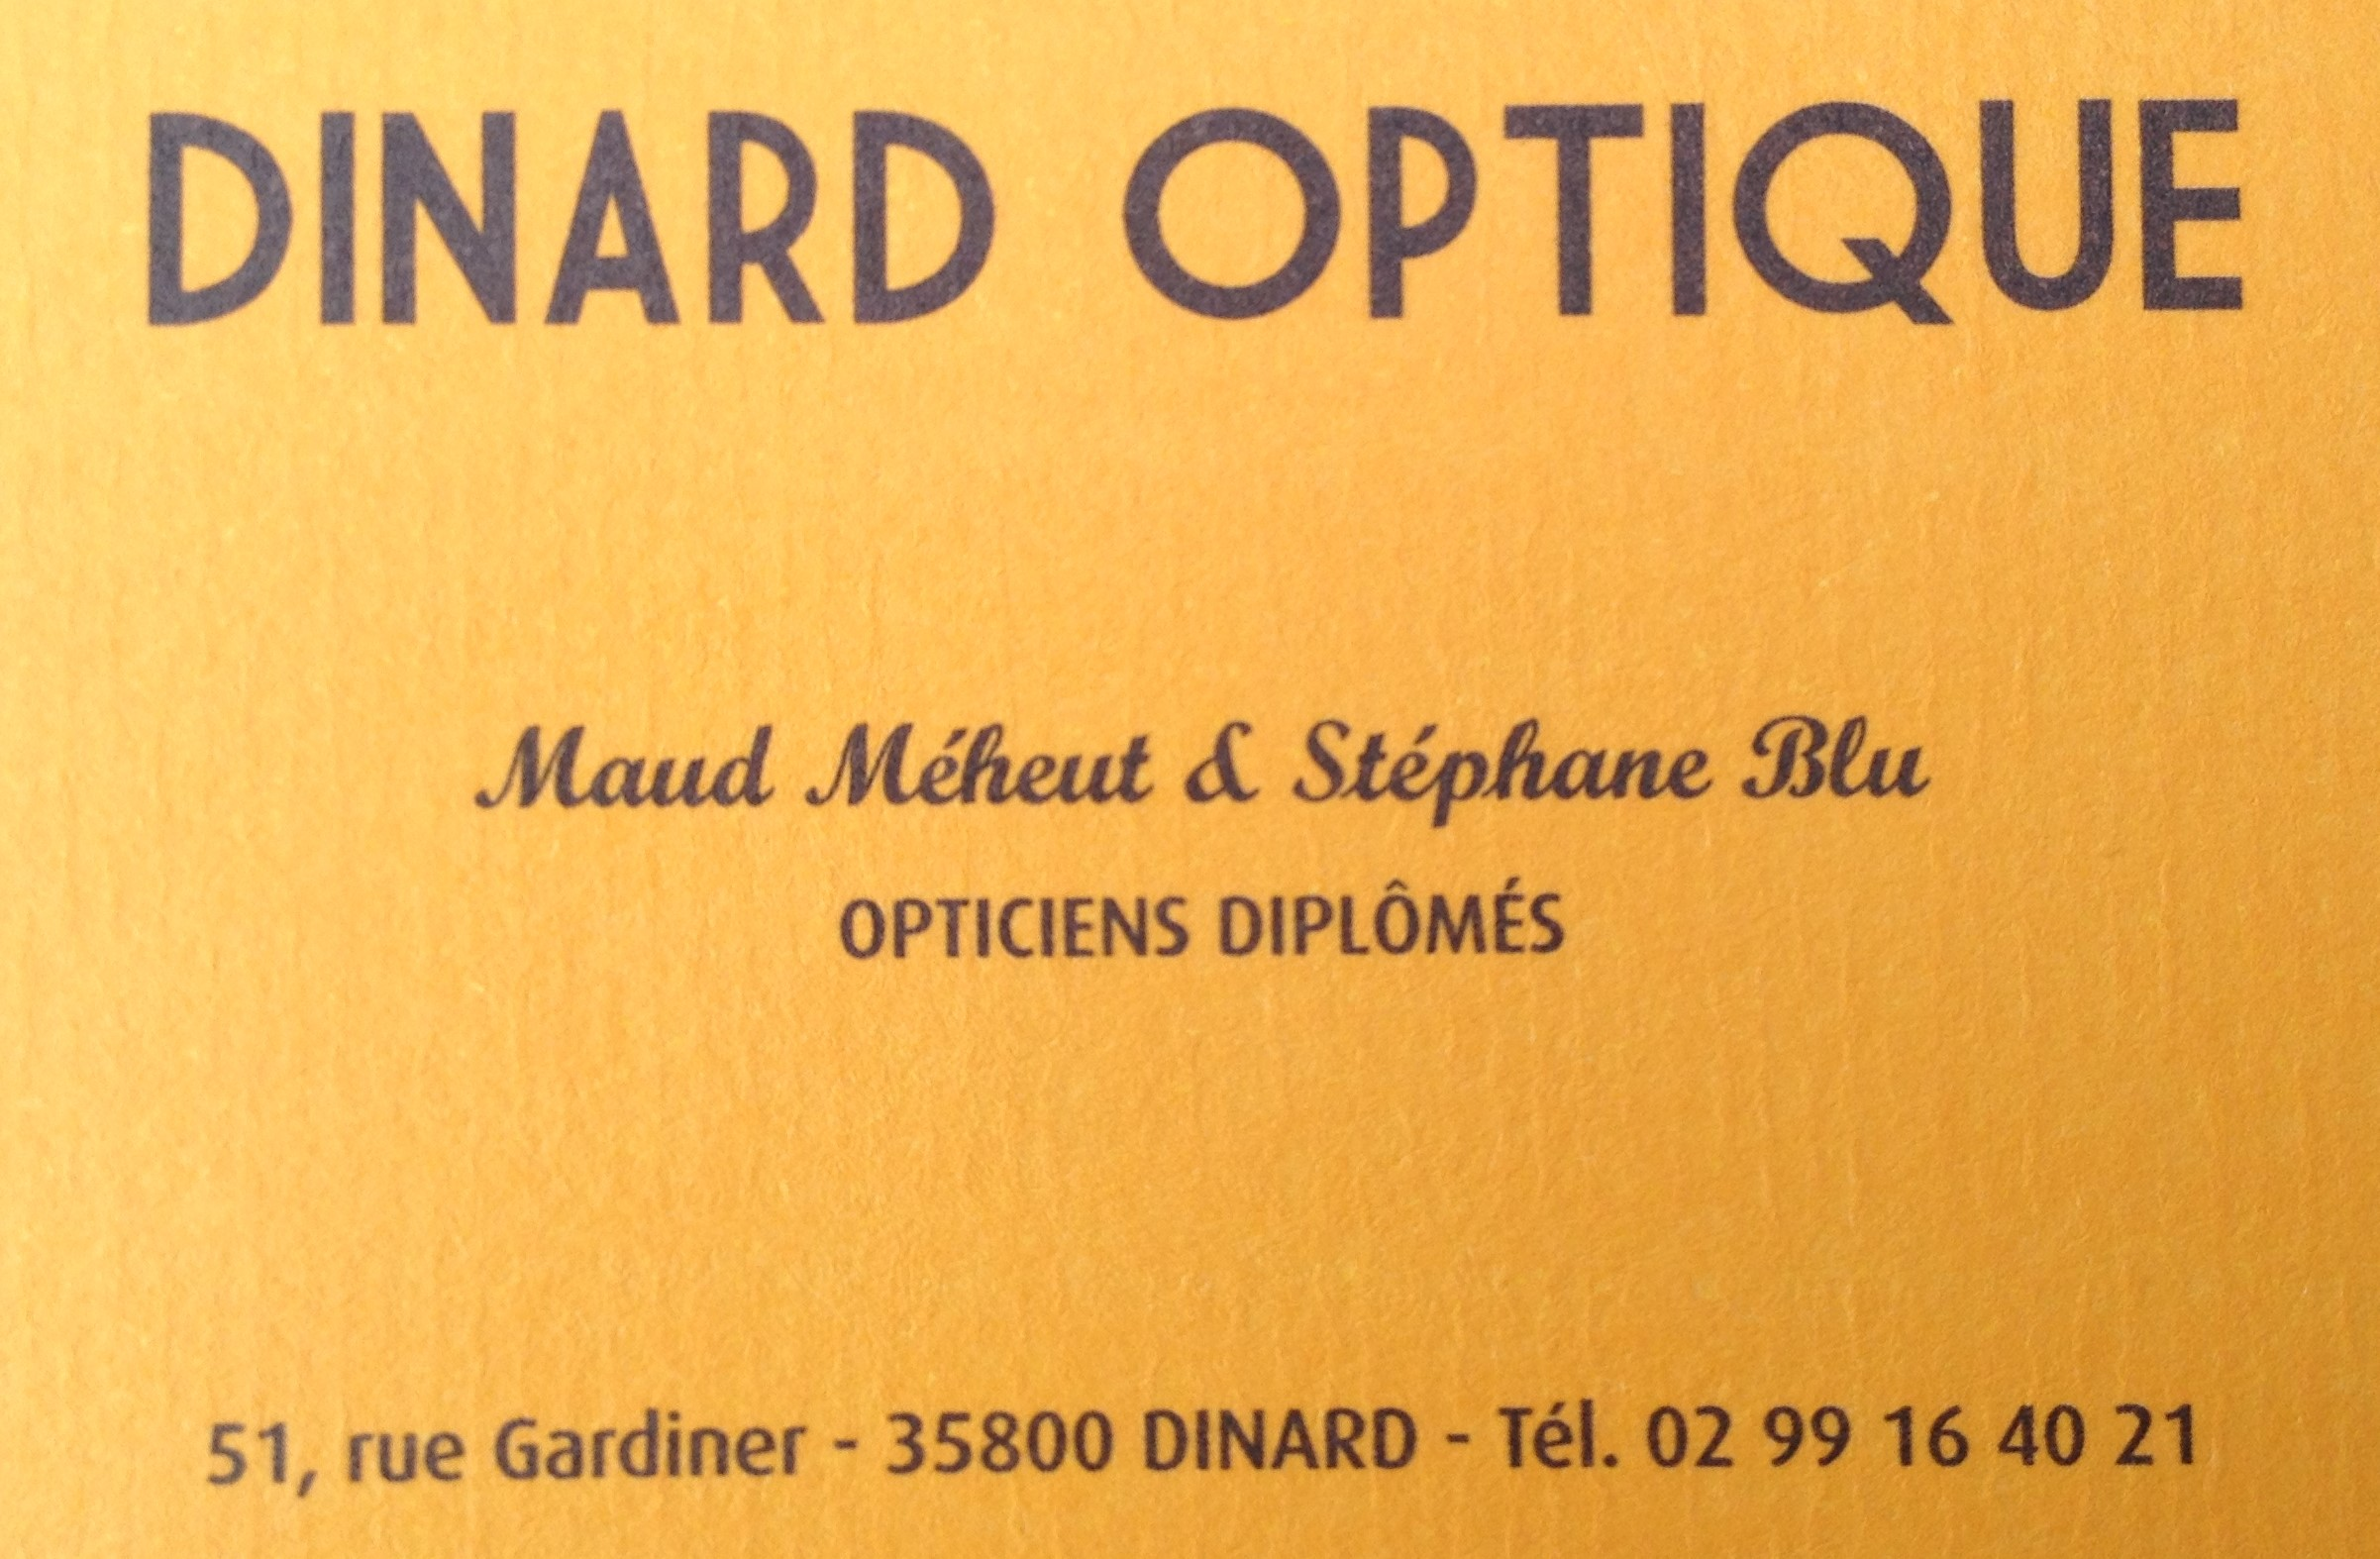 DINARD OPTIQUE